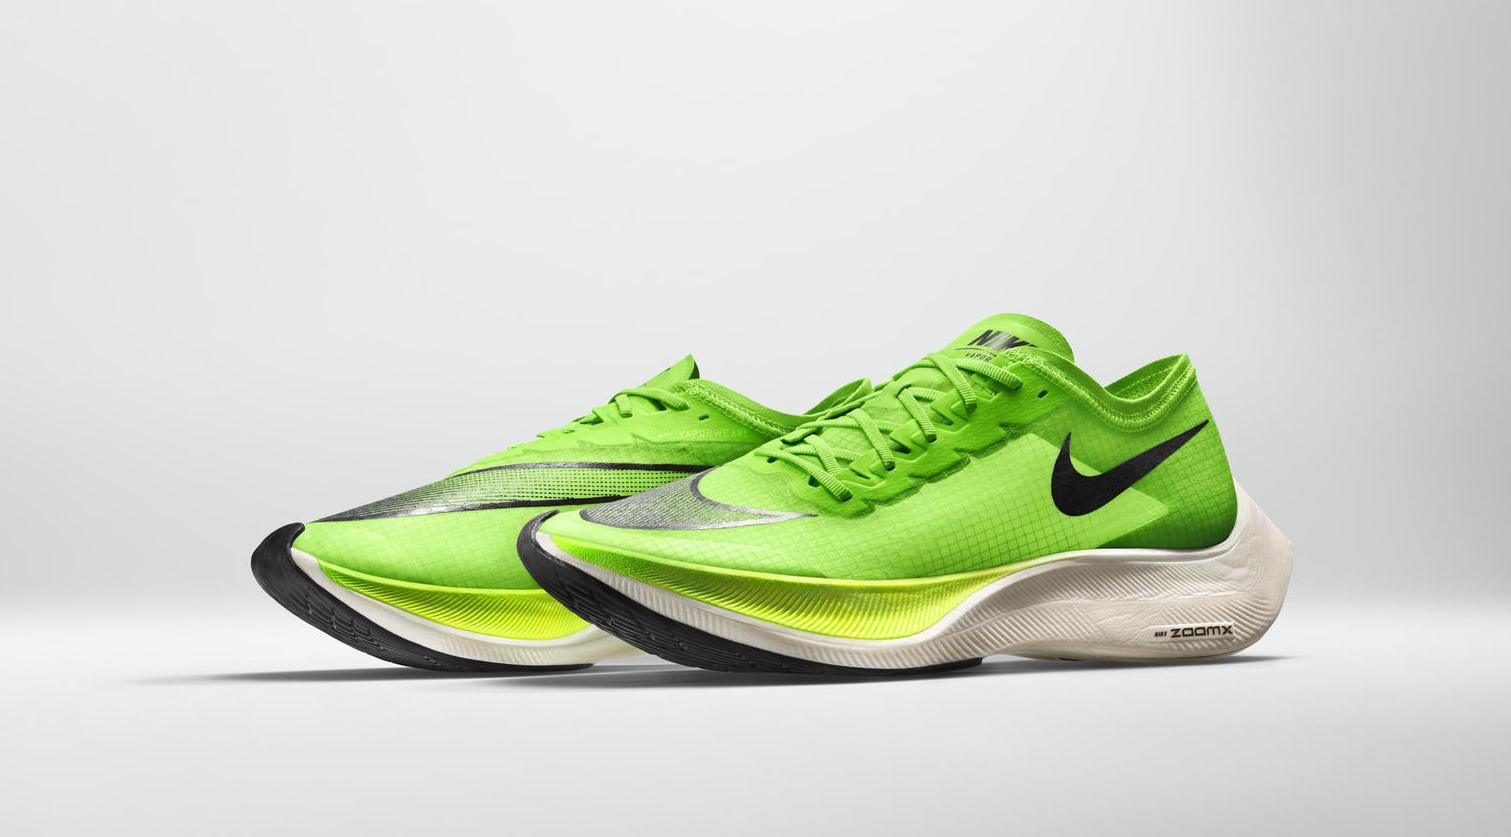 3e3c967e9a2e Nike NEXT%  Marathon running shoe so good it became controversial has been  improved